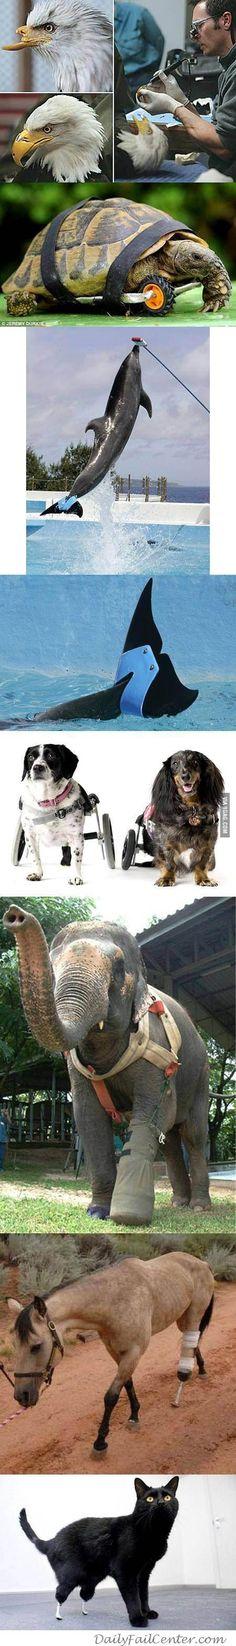 Animal prosthesis